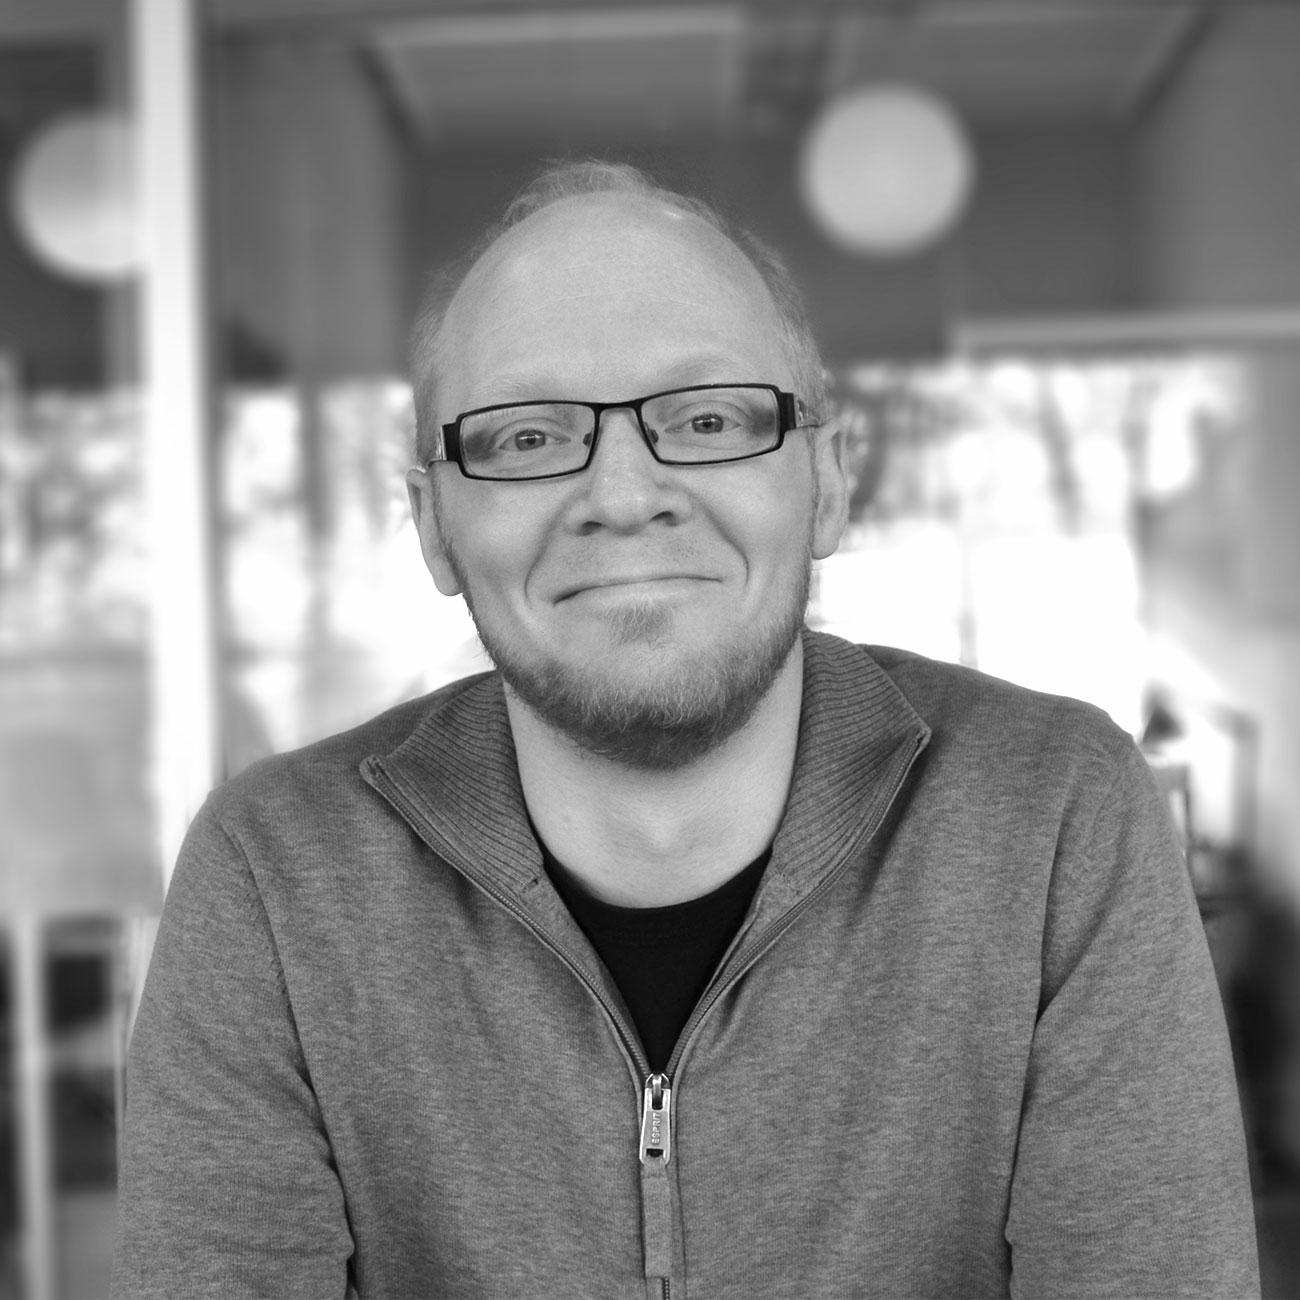 http://horisontgruppen.dk/wp-content/uploads/2016/04/Anders.jpg